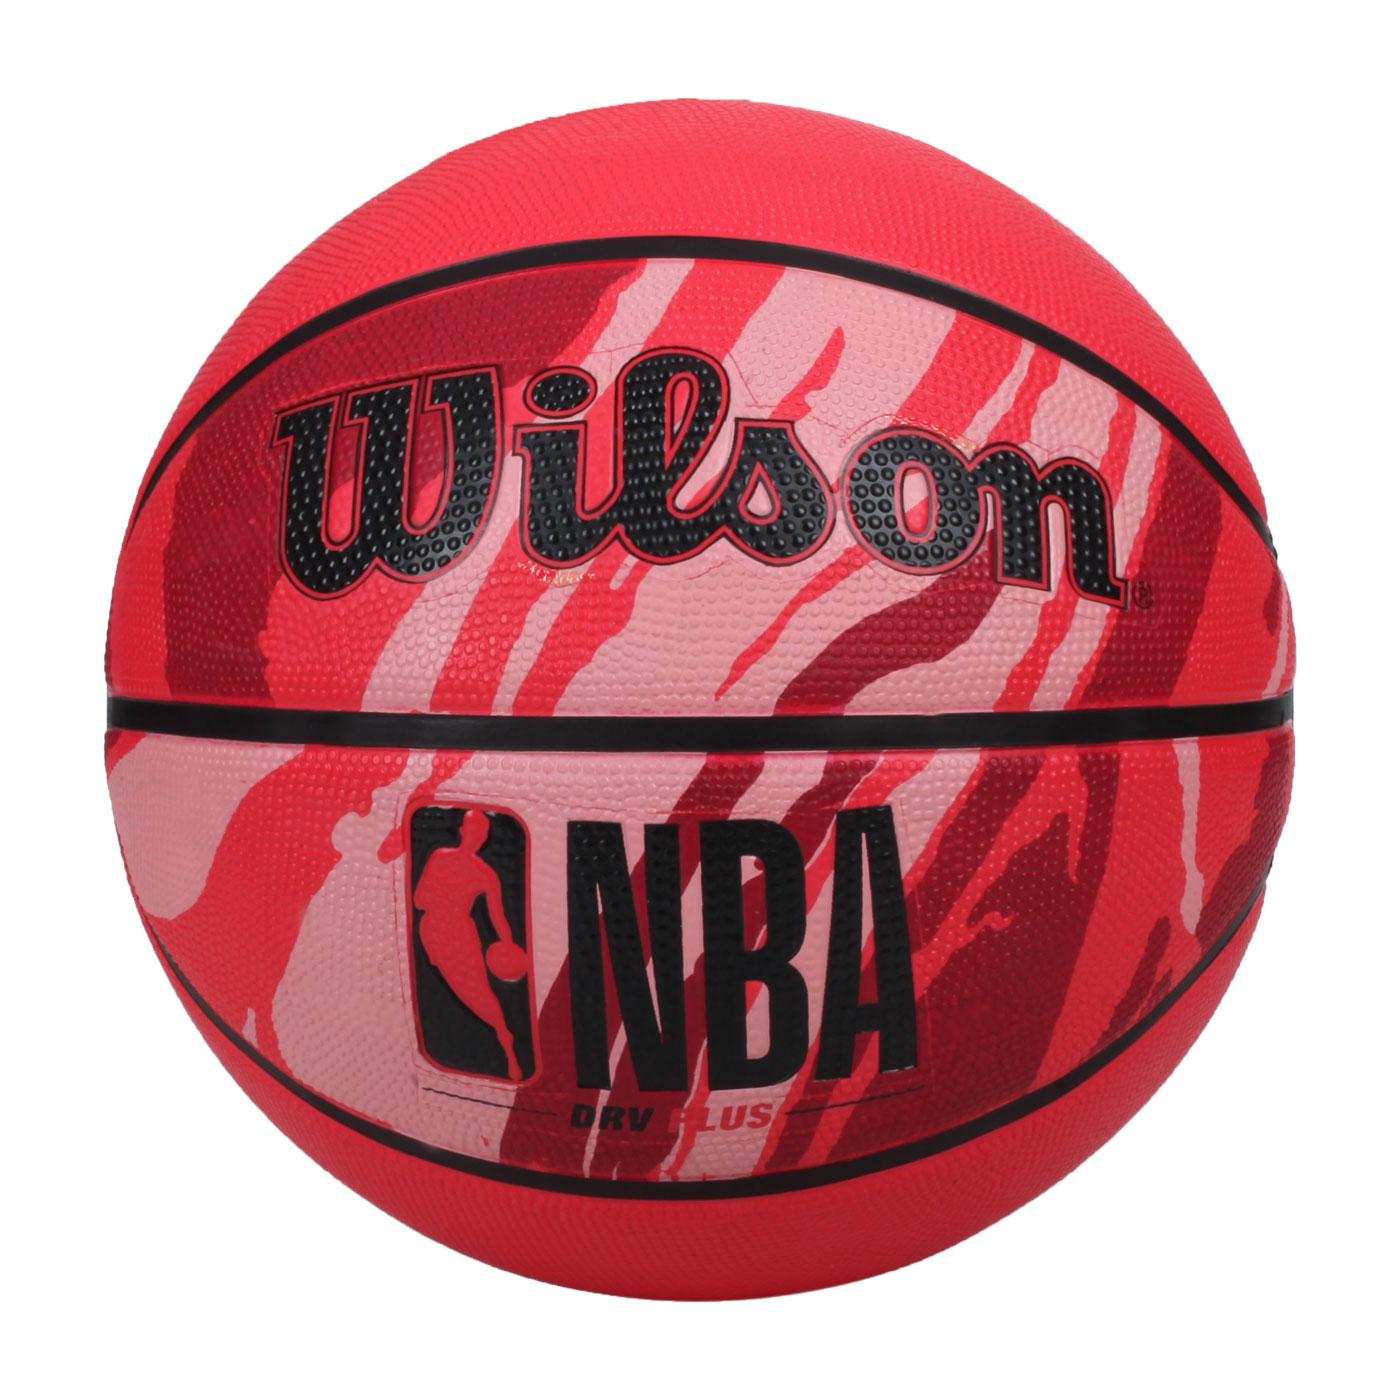 WILSON NBA DRV系列PLUS 橡膠籃球#7 WTB9203XB07 - 紅黑